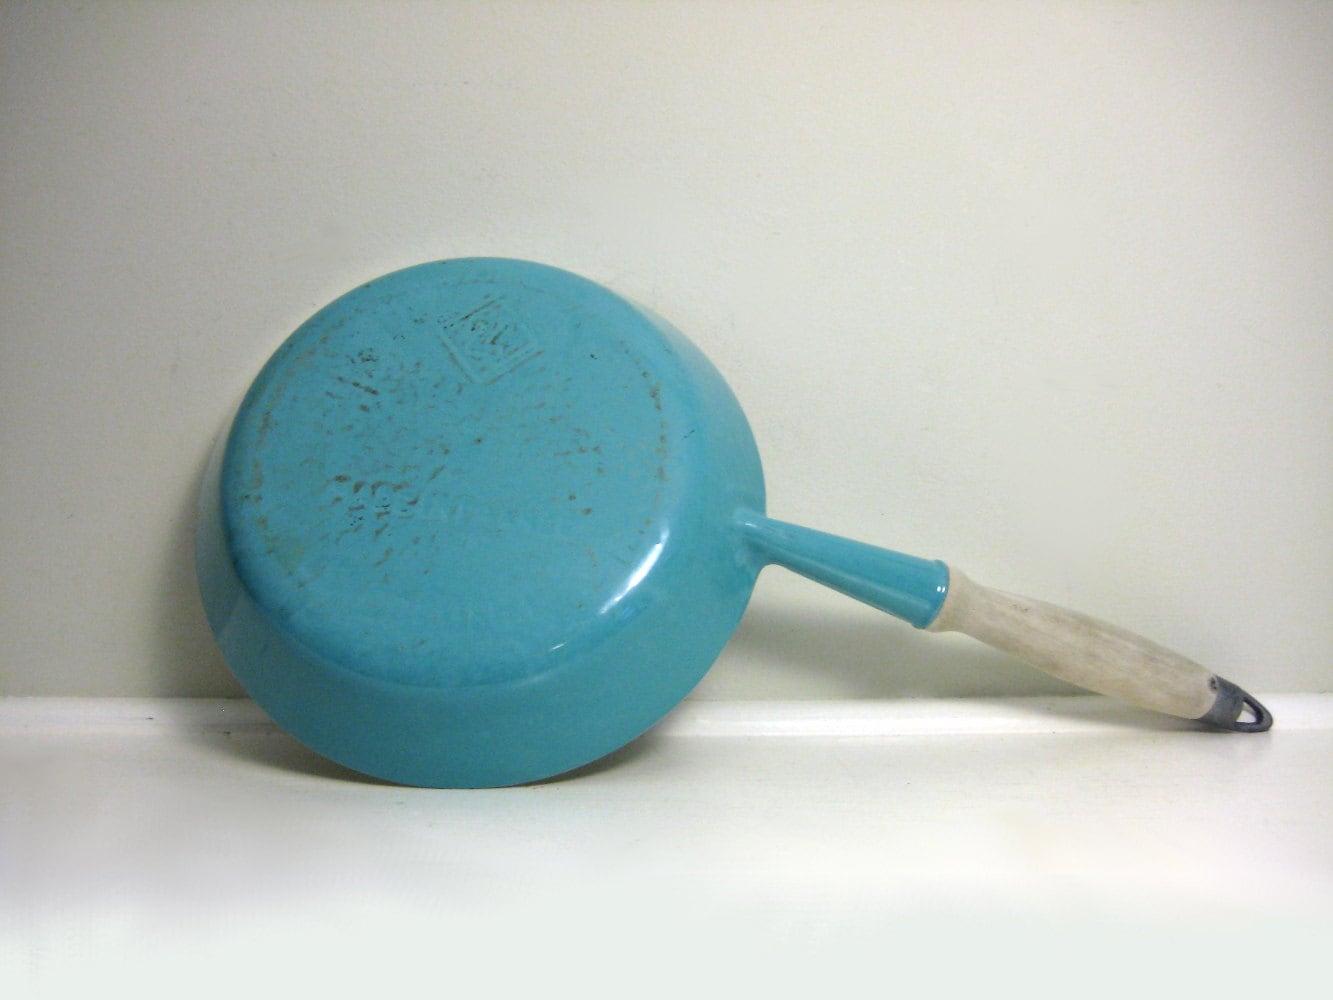 Vintage Le Creuset Skillet Pan Aqua Blue 1960s Mid Century